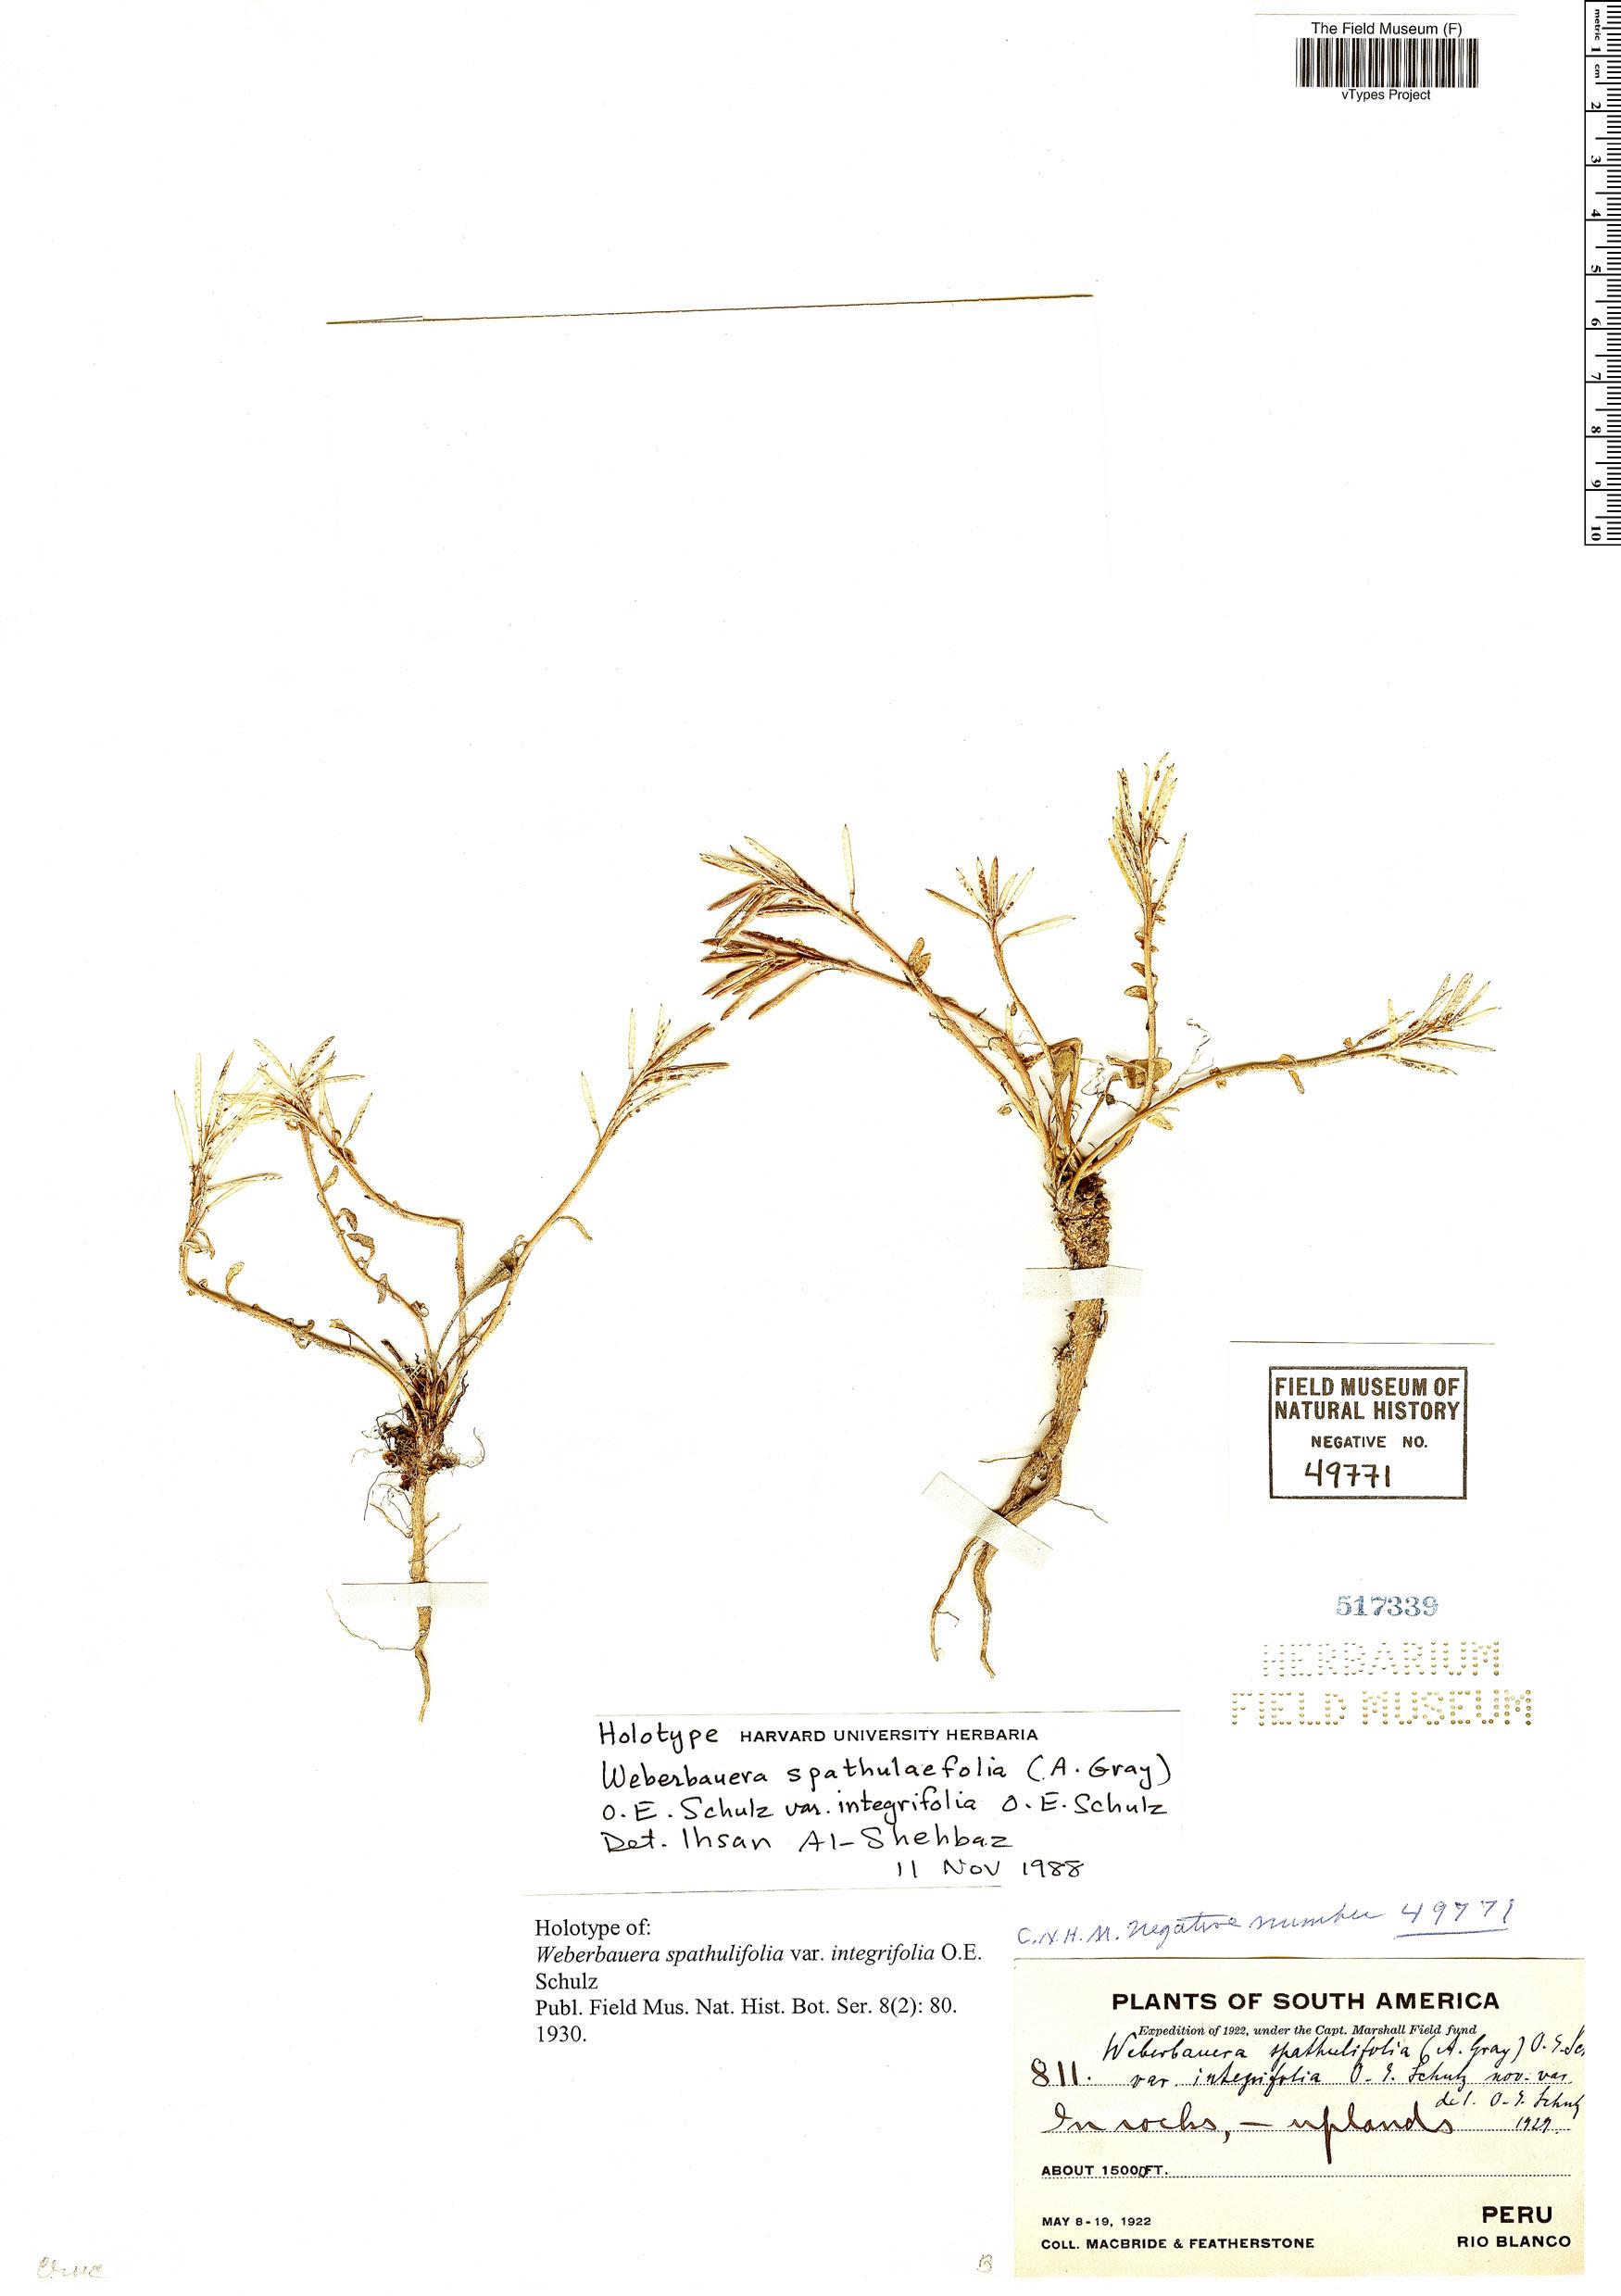 Specimen: Weberbauera spathulifolia